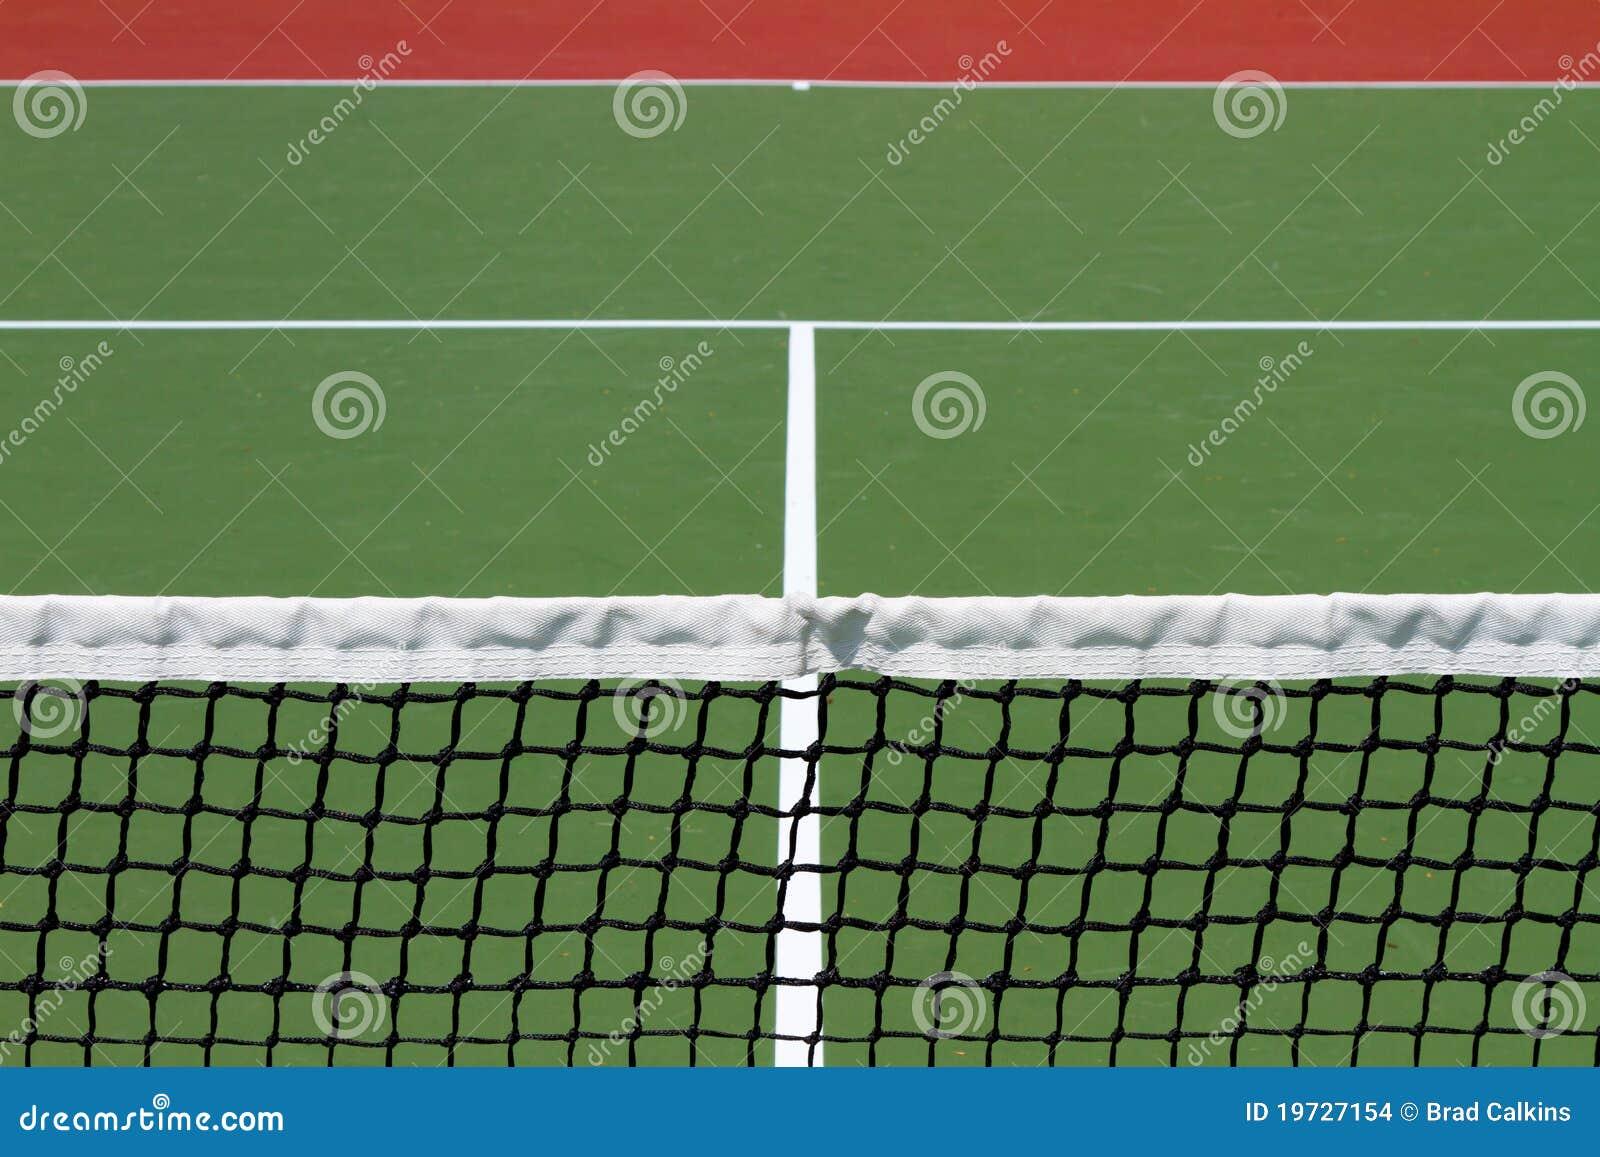 Netto tennis